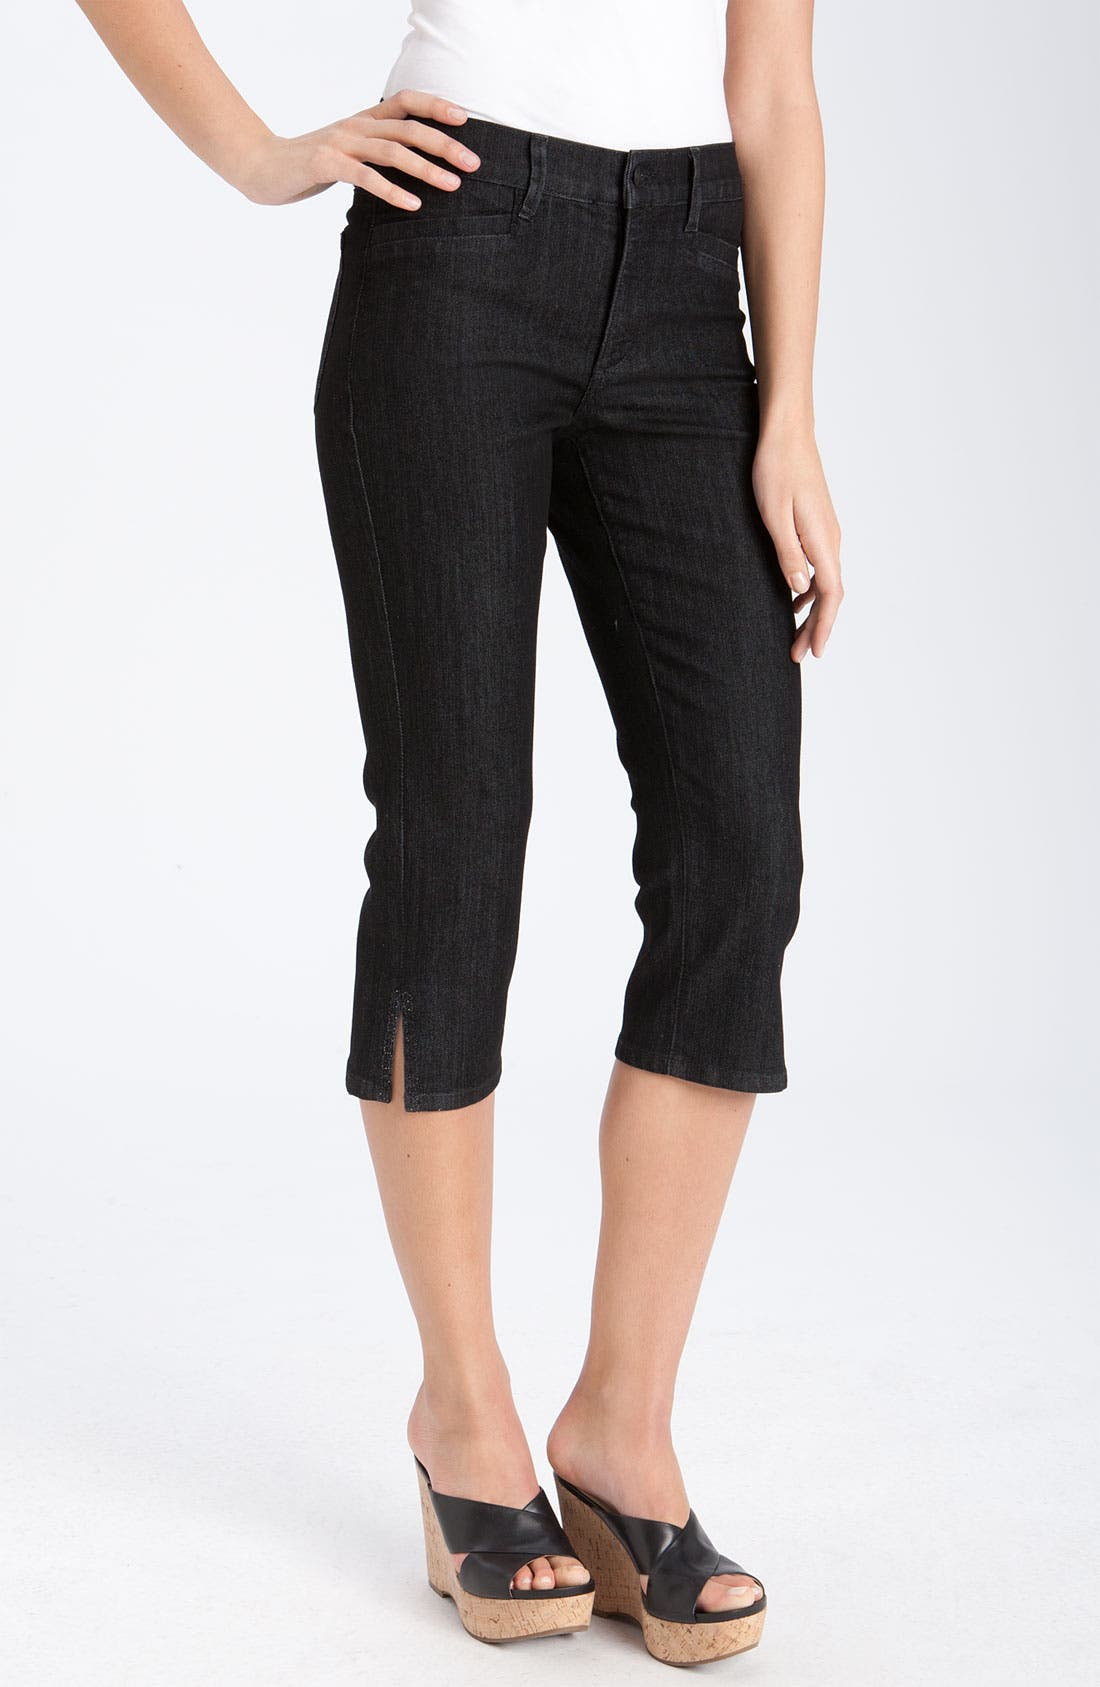 Main Image - NYDJ 'Joan' Embellished Crop Stretch Jeans